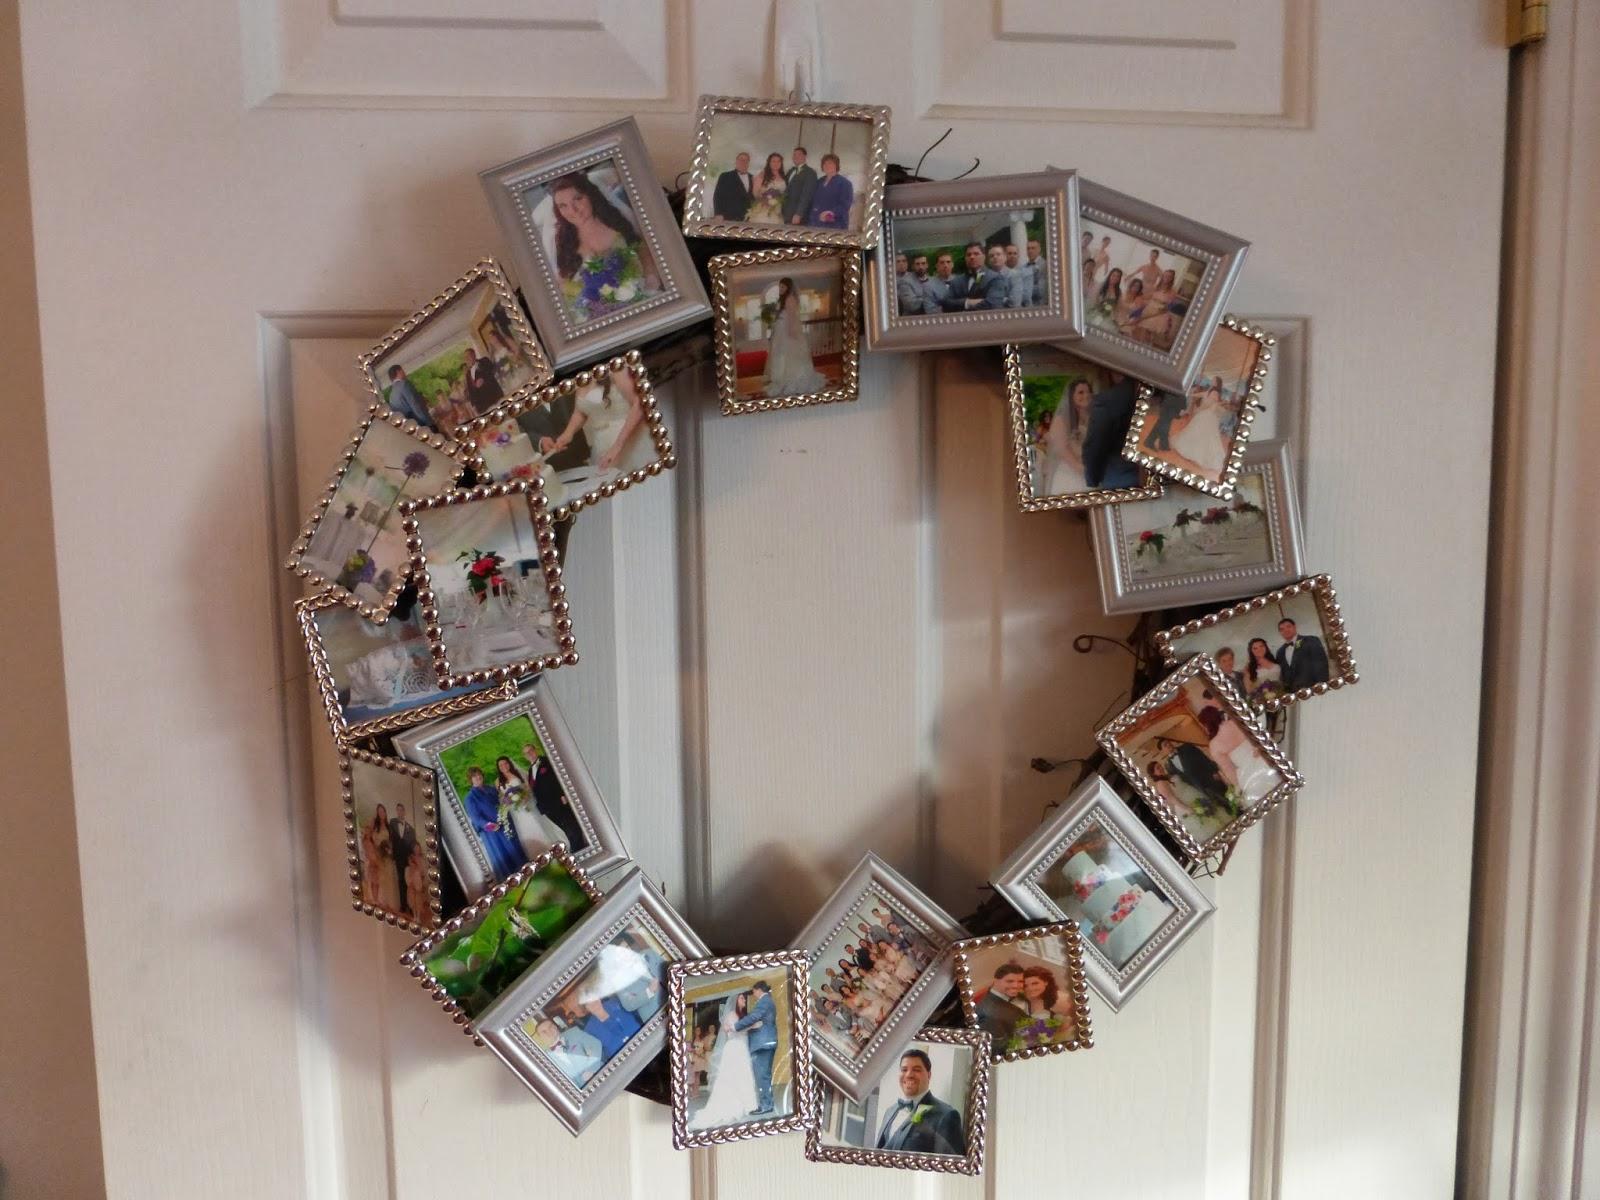 Nutfield Genealogy: Favorite Christmas Gifts 2013